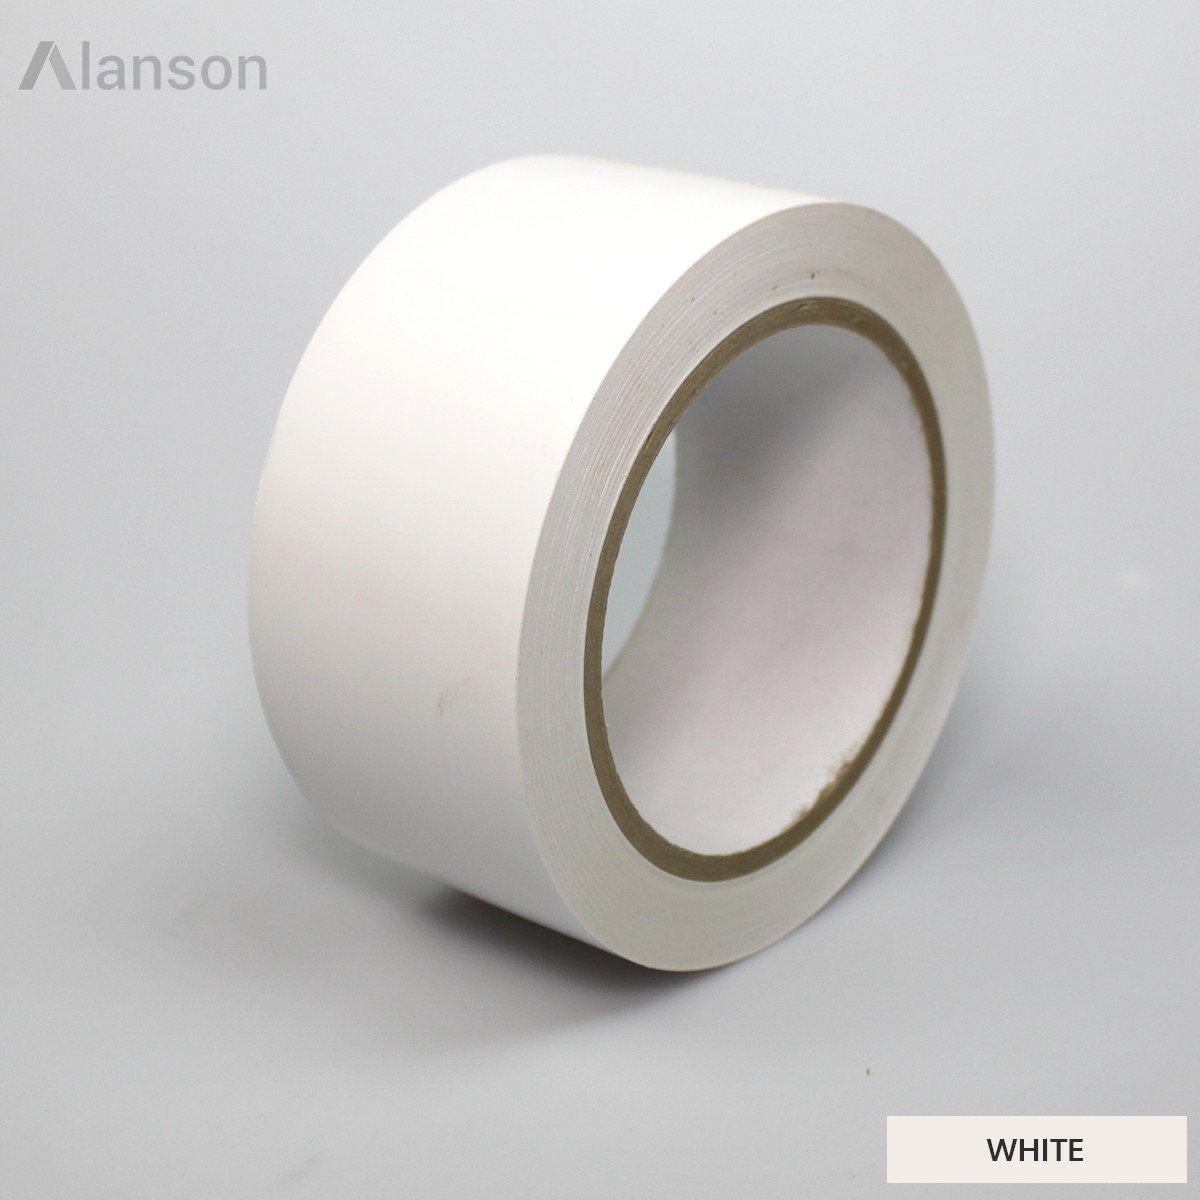 2''(48mm) x 36 yds, White General Purpose Vinyl Tape (65013) [24 Rolls]